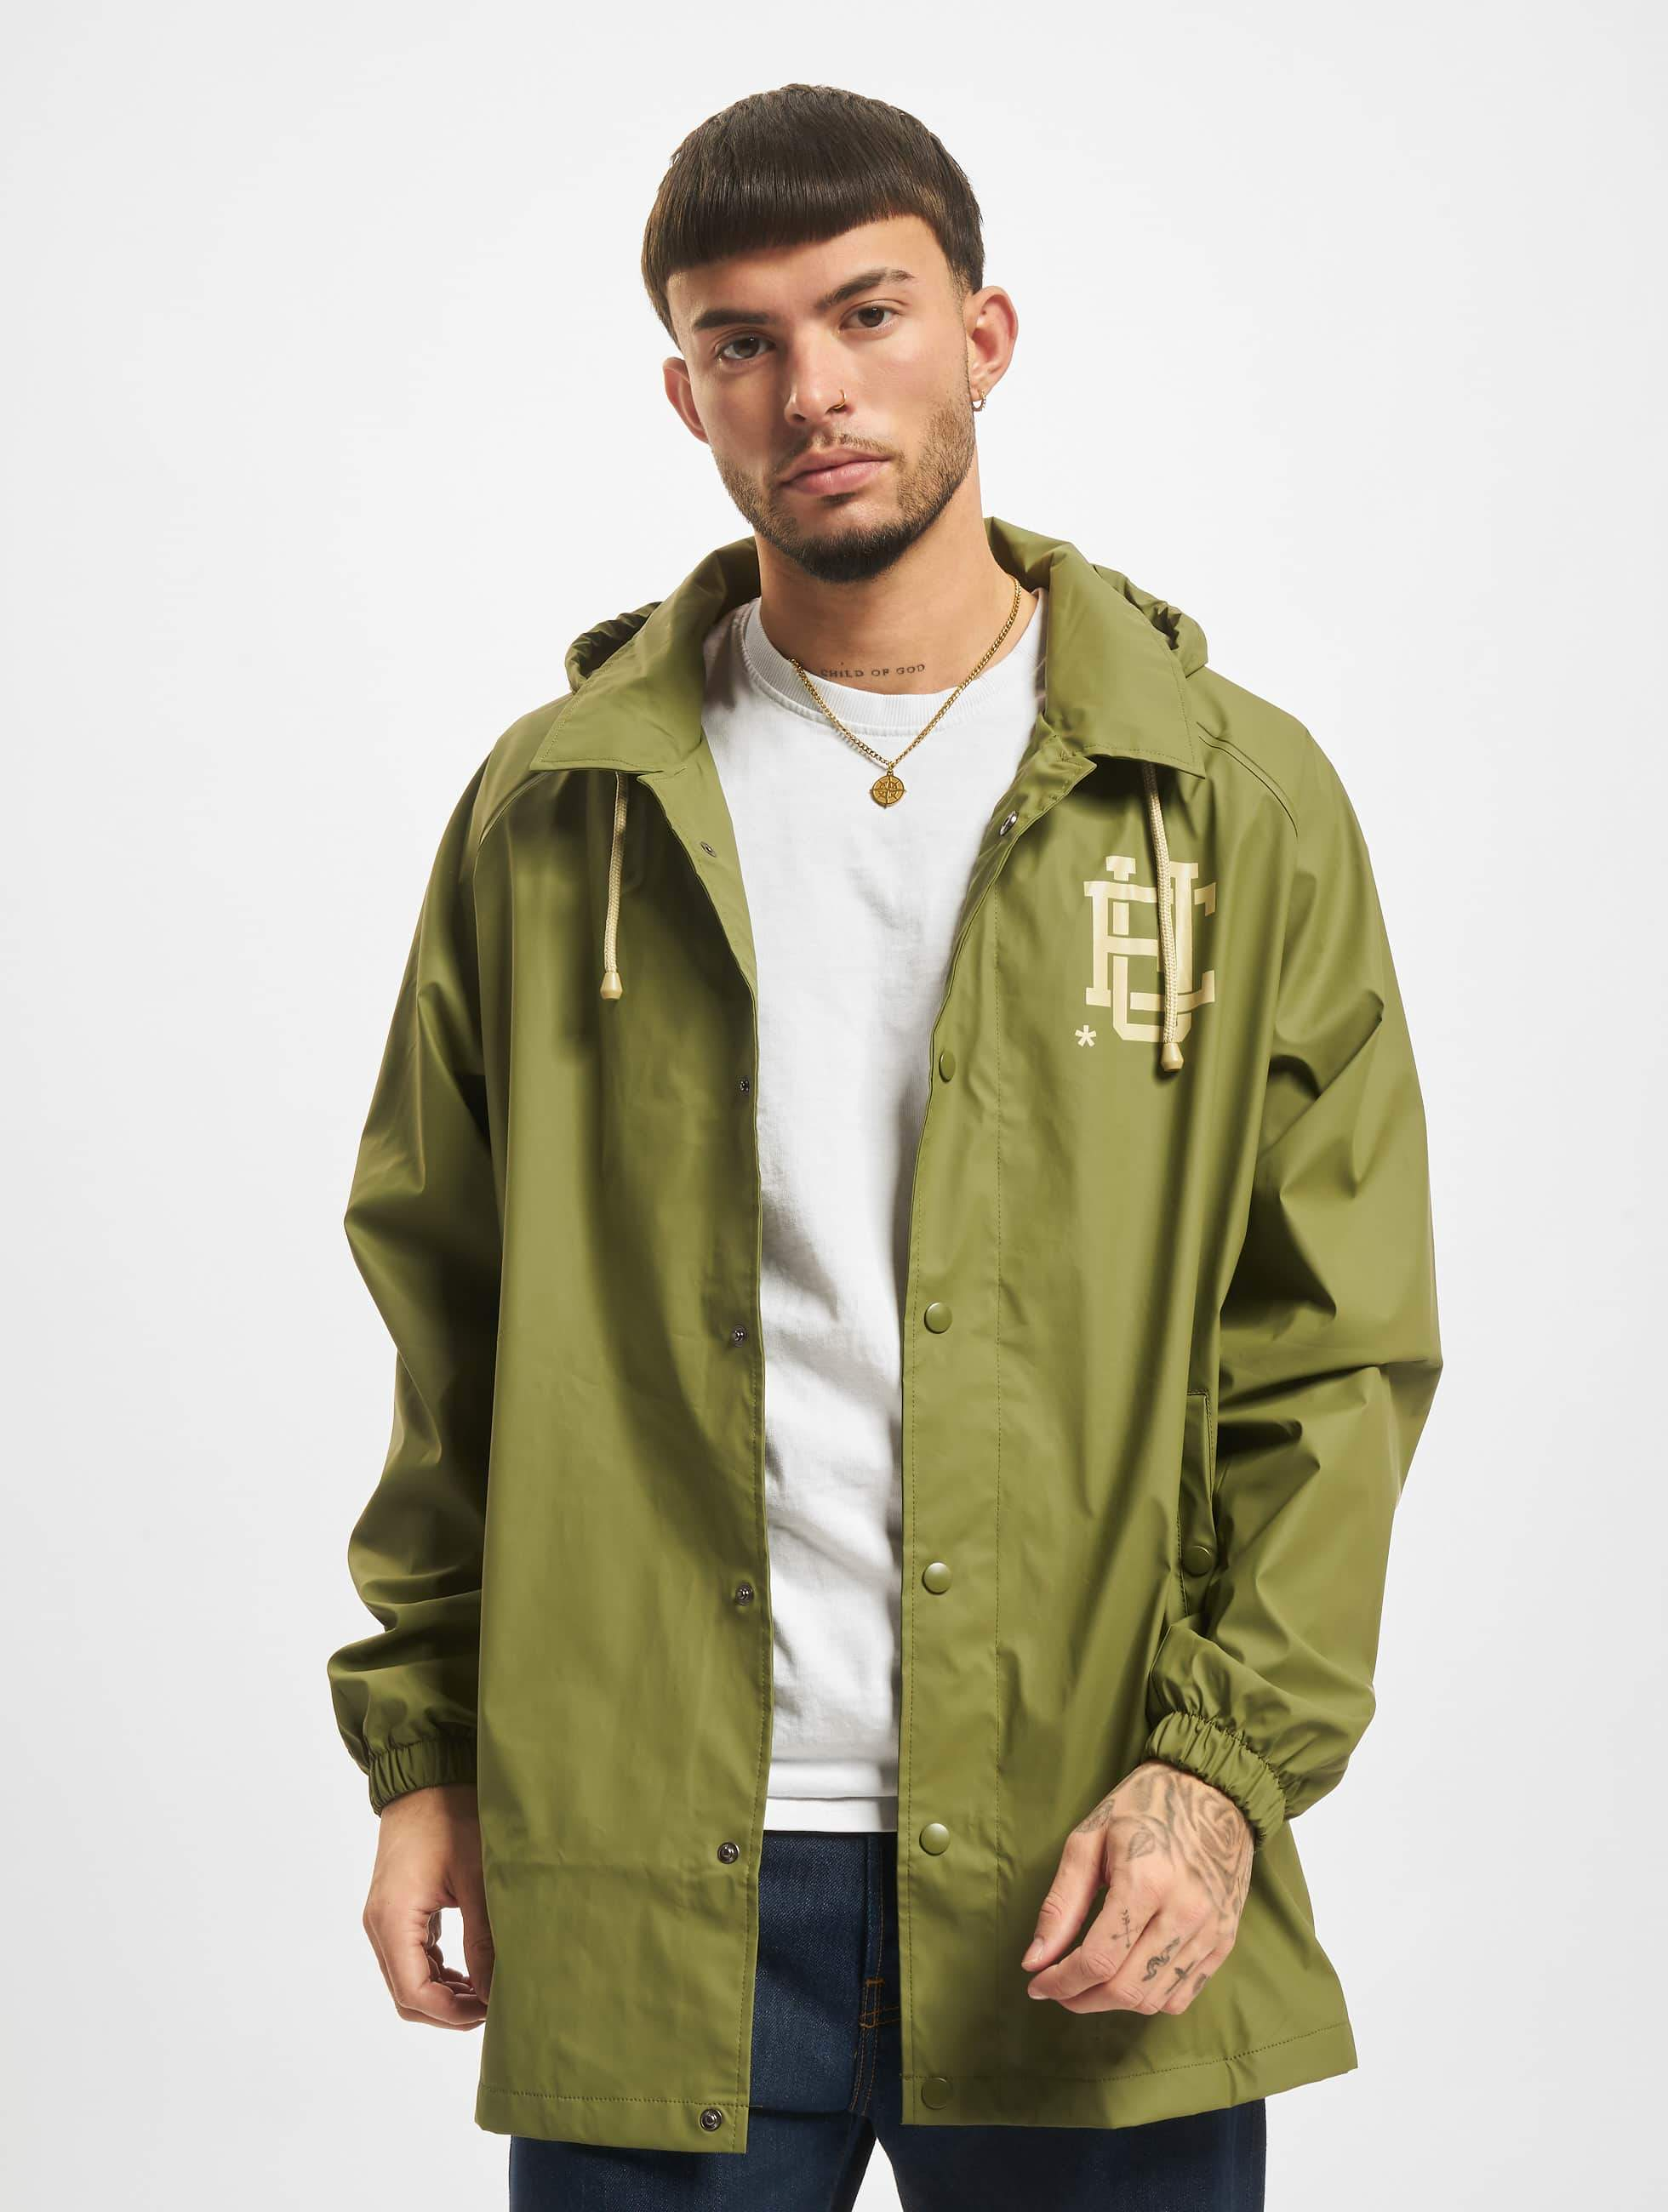 Ecko Unltd. / Lightweight Jacket Raining Man in camouflage 2XL